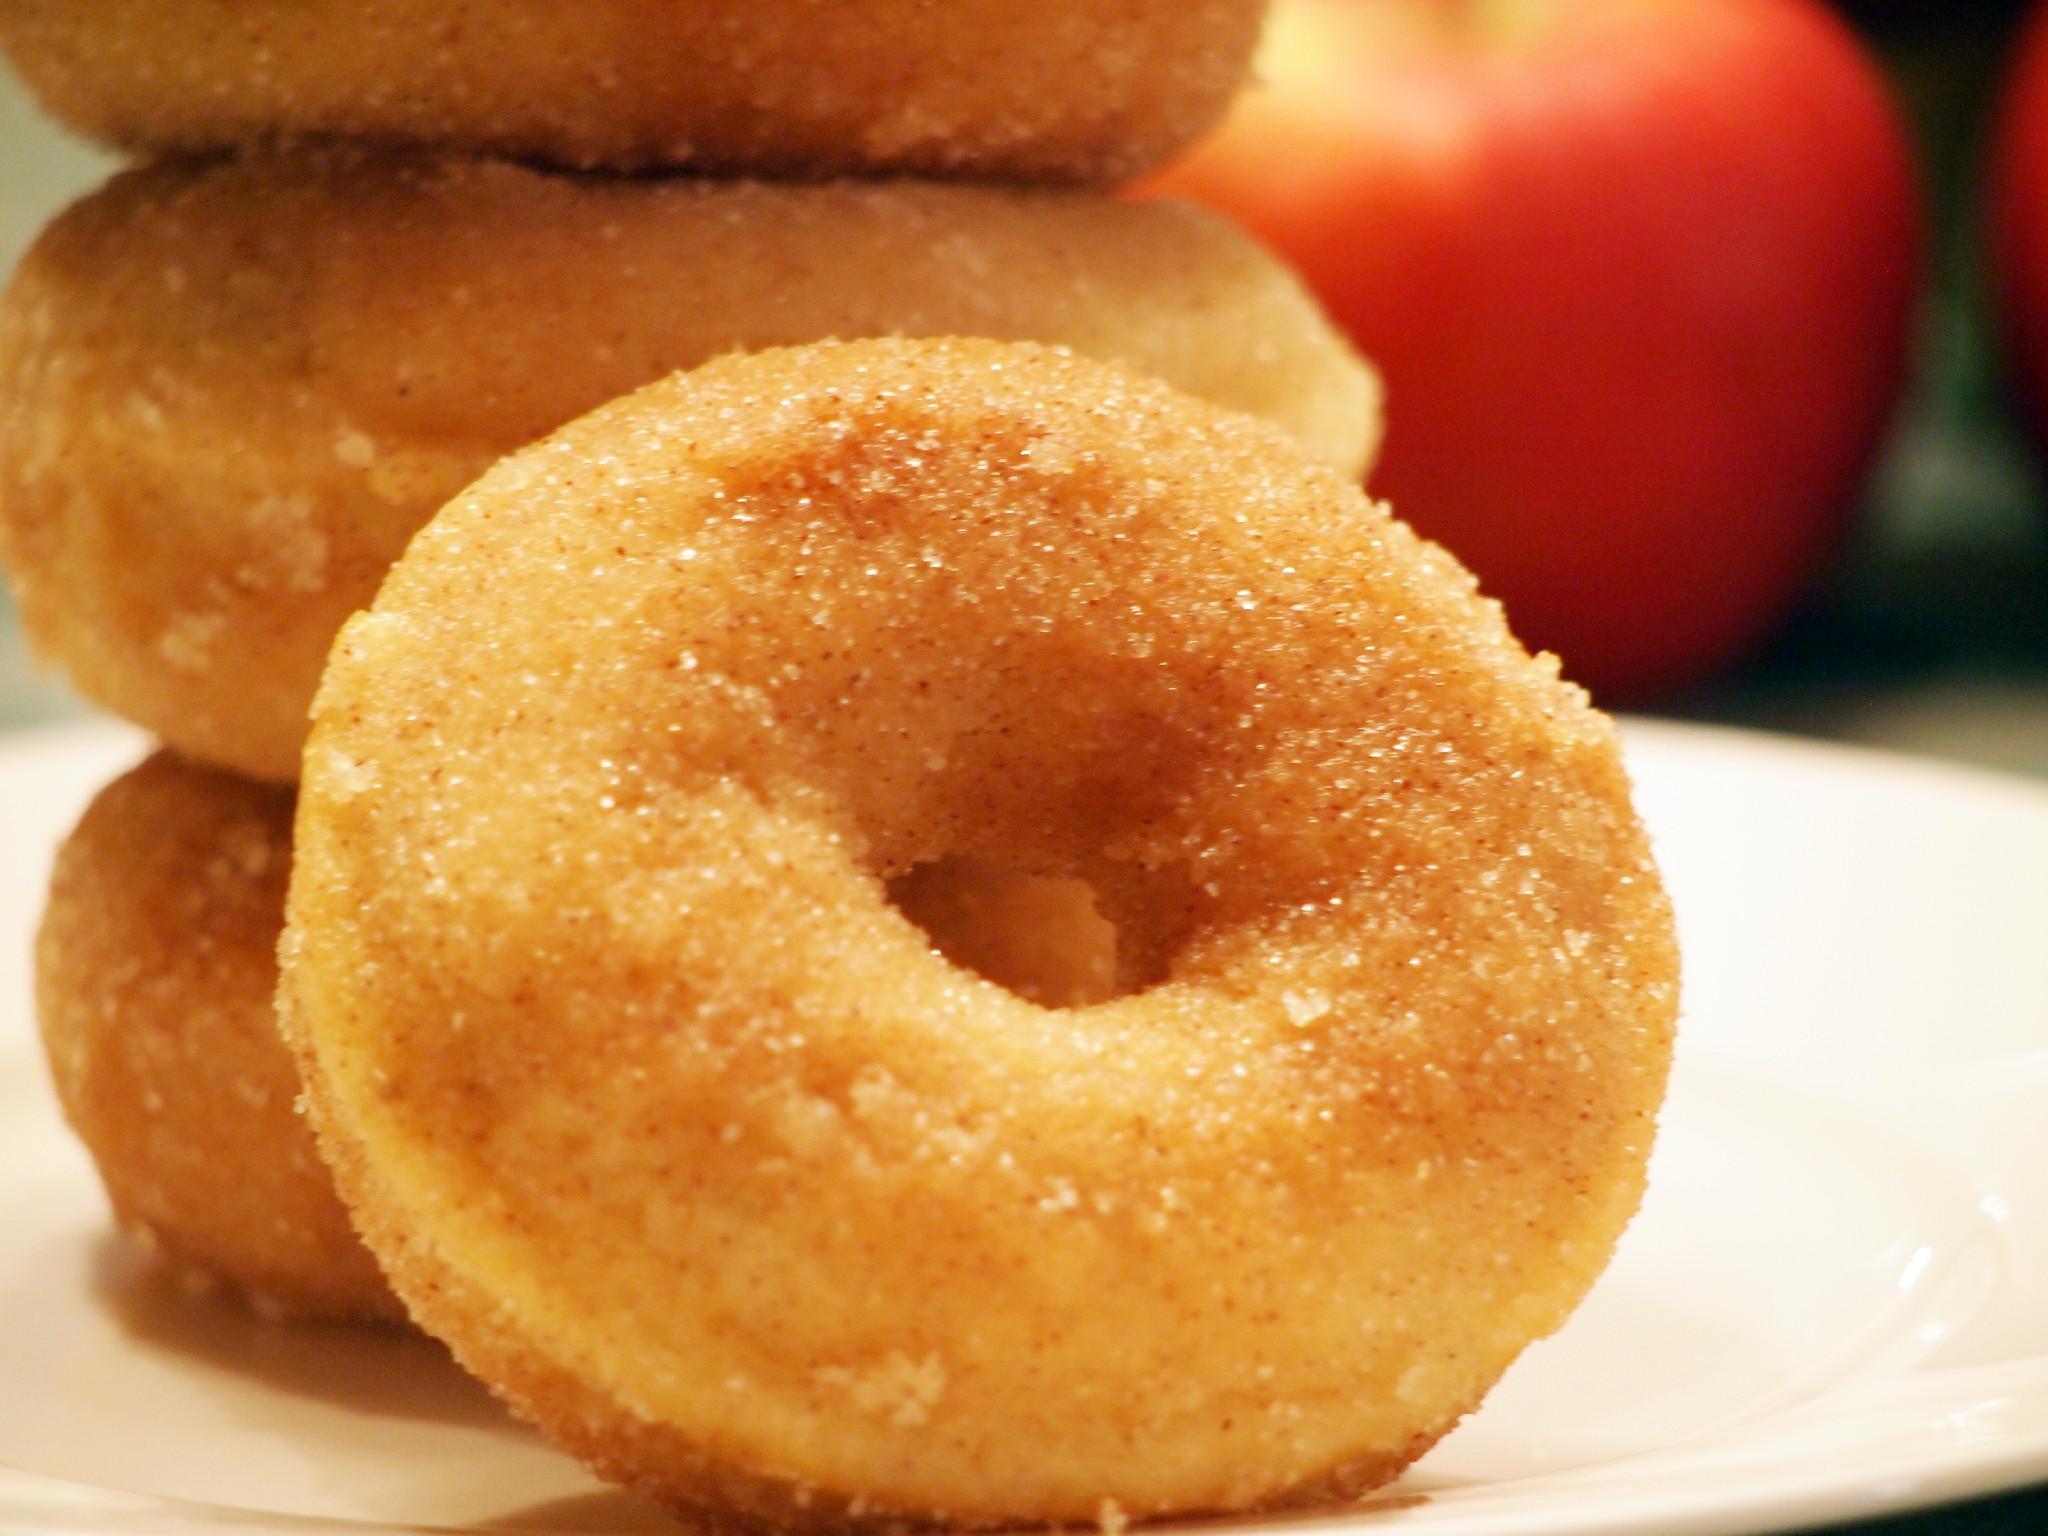 ... Again. A Baked Apple Cinnamon Doughnuts Recipe! | Comfortably Domestic